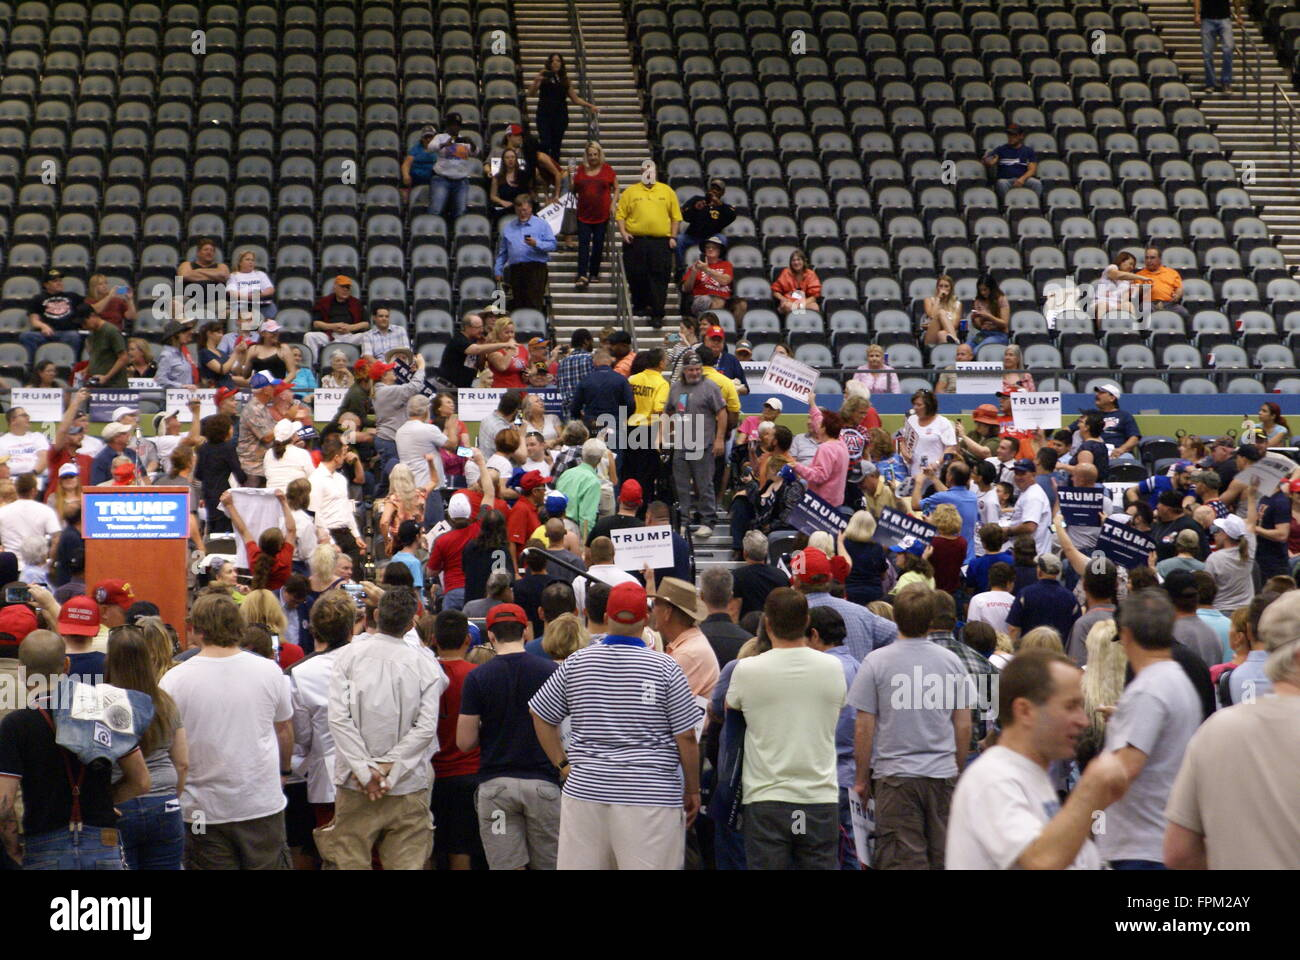 Tucson, USA. 19. März 2016. Mehrere Demonstranten stören Donald Trump politische Kundgebung in Tucson Arizona, USA. Stockfoto